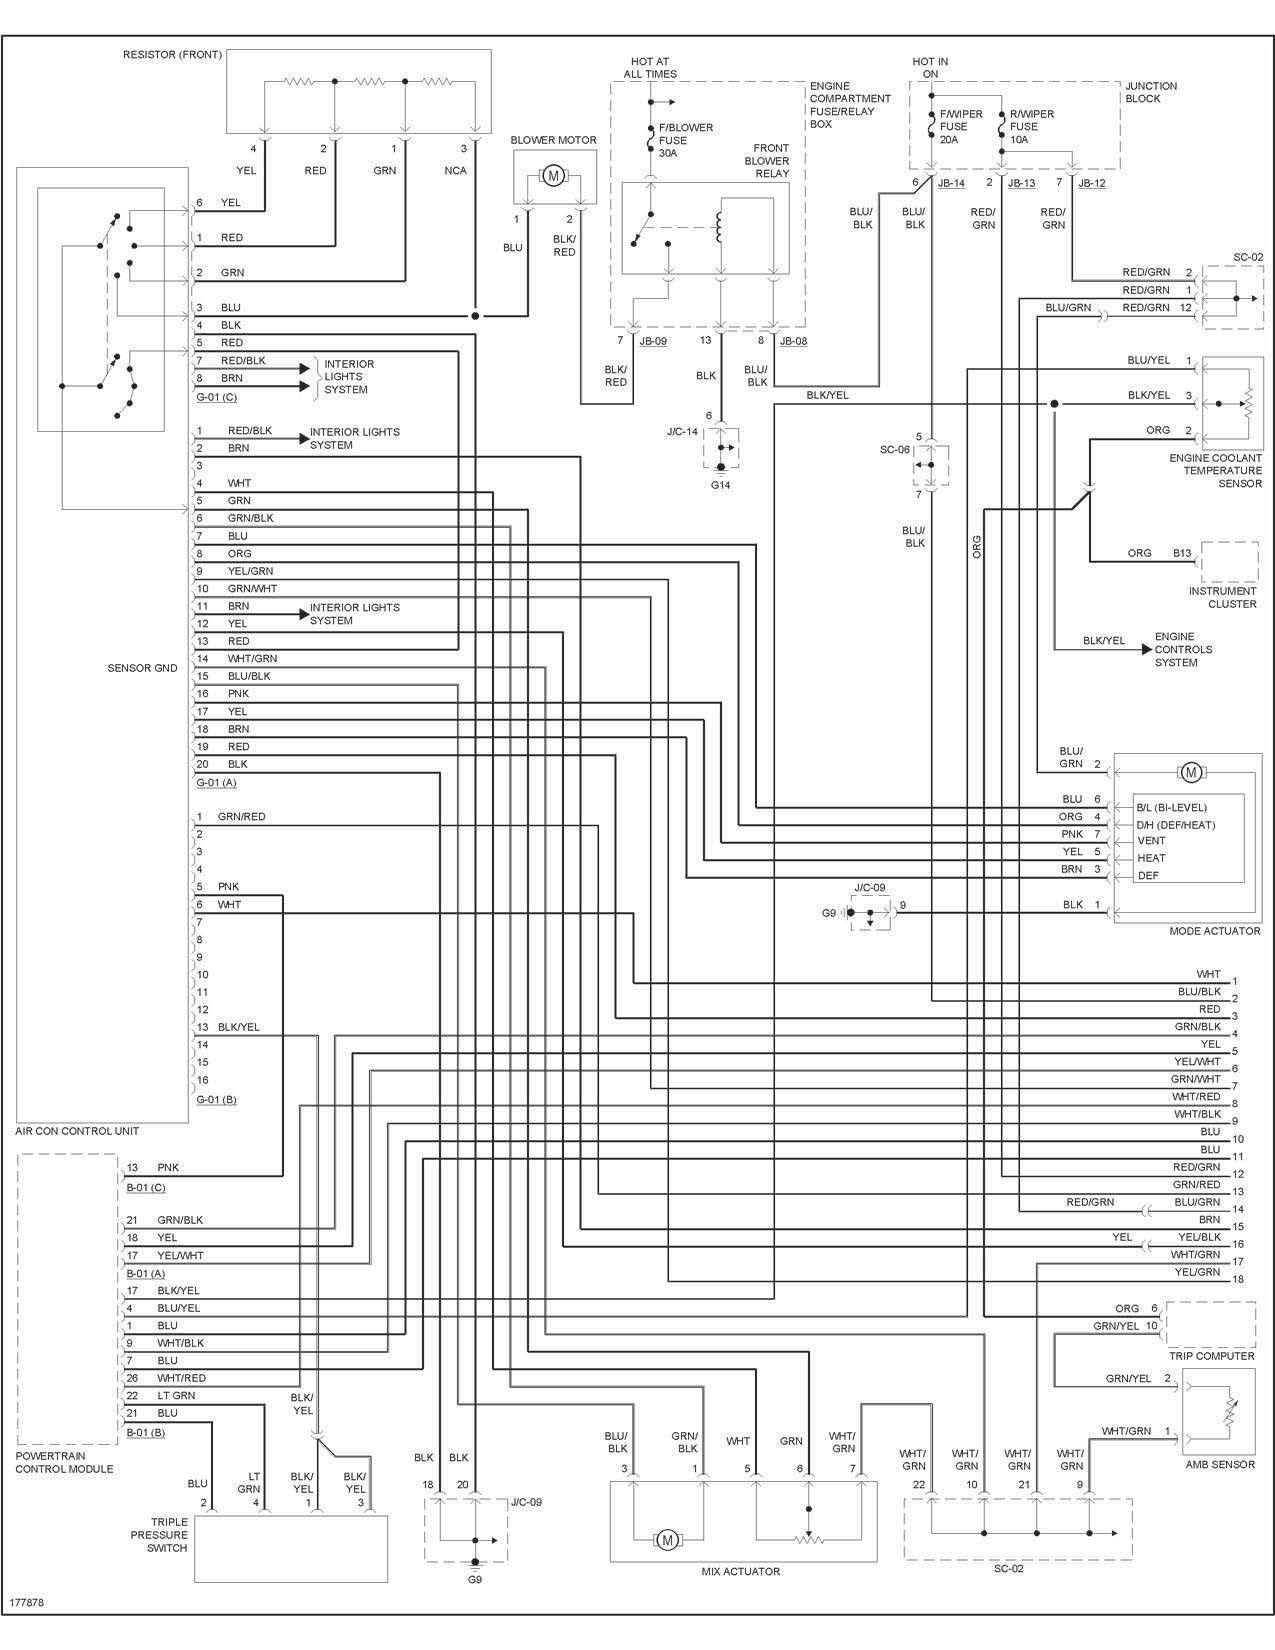 2005 Kia Sorento Engine Diagram Kia Picanto Kia Sorento Kia Sedona